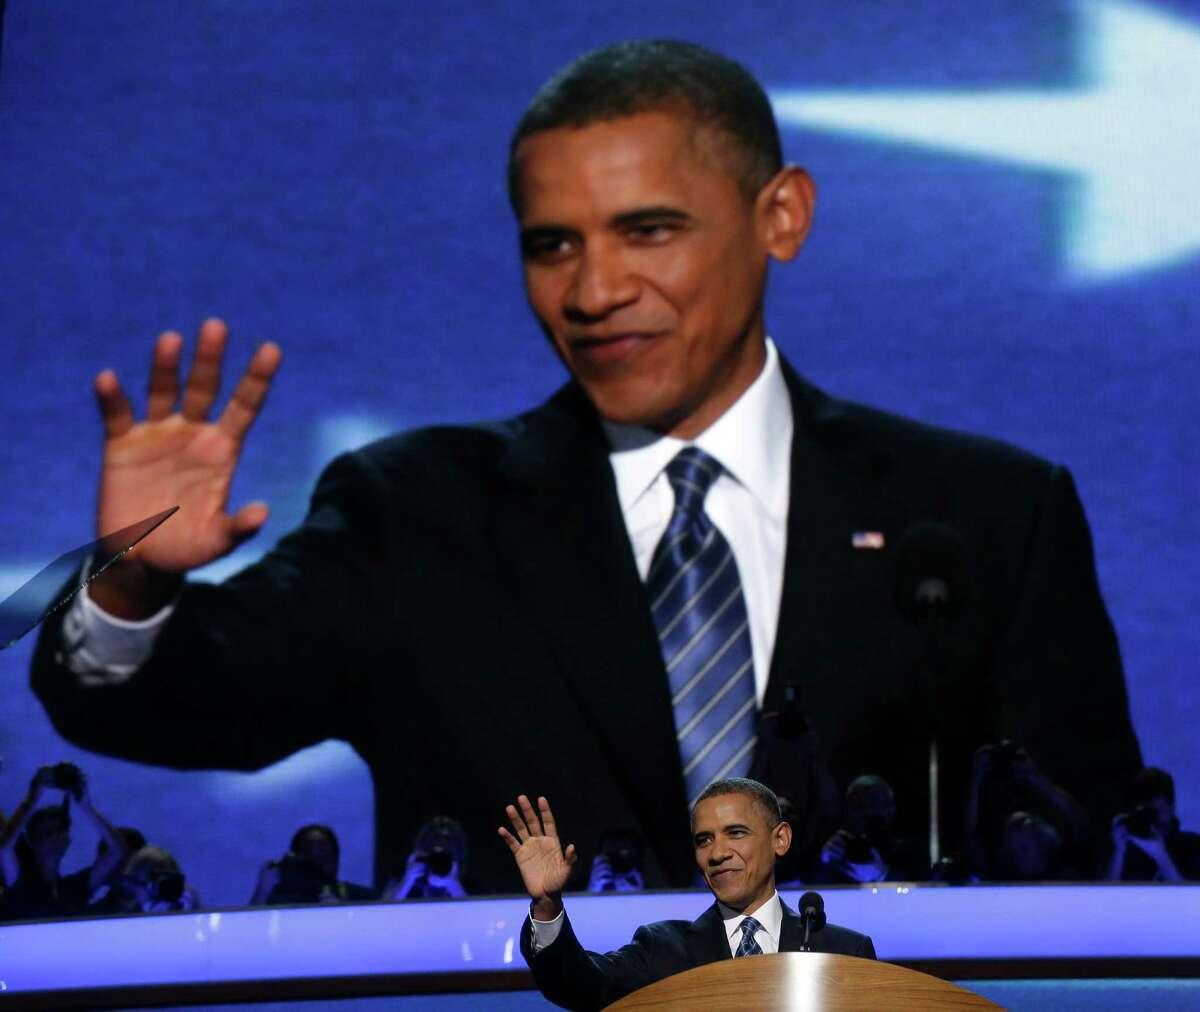 President Barack Obama addresses the Democratic National Convention in Charlotte, N.C., on Thursday, Sept. 6, 2012. (AP Photo/Charles Dharapak)